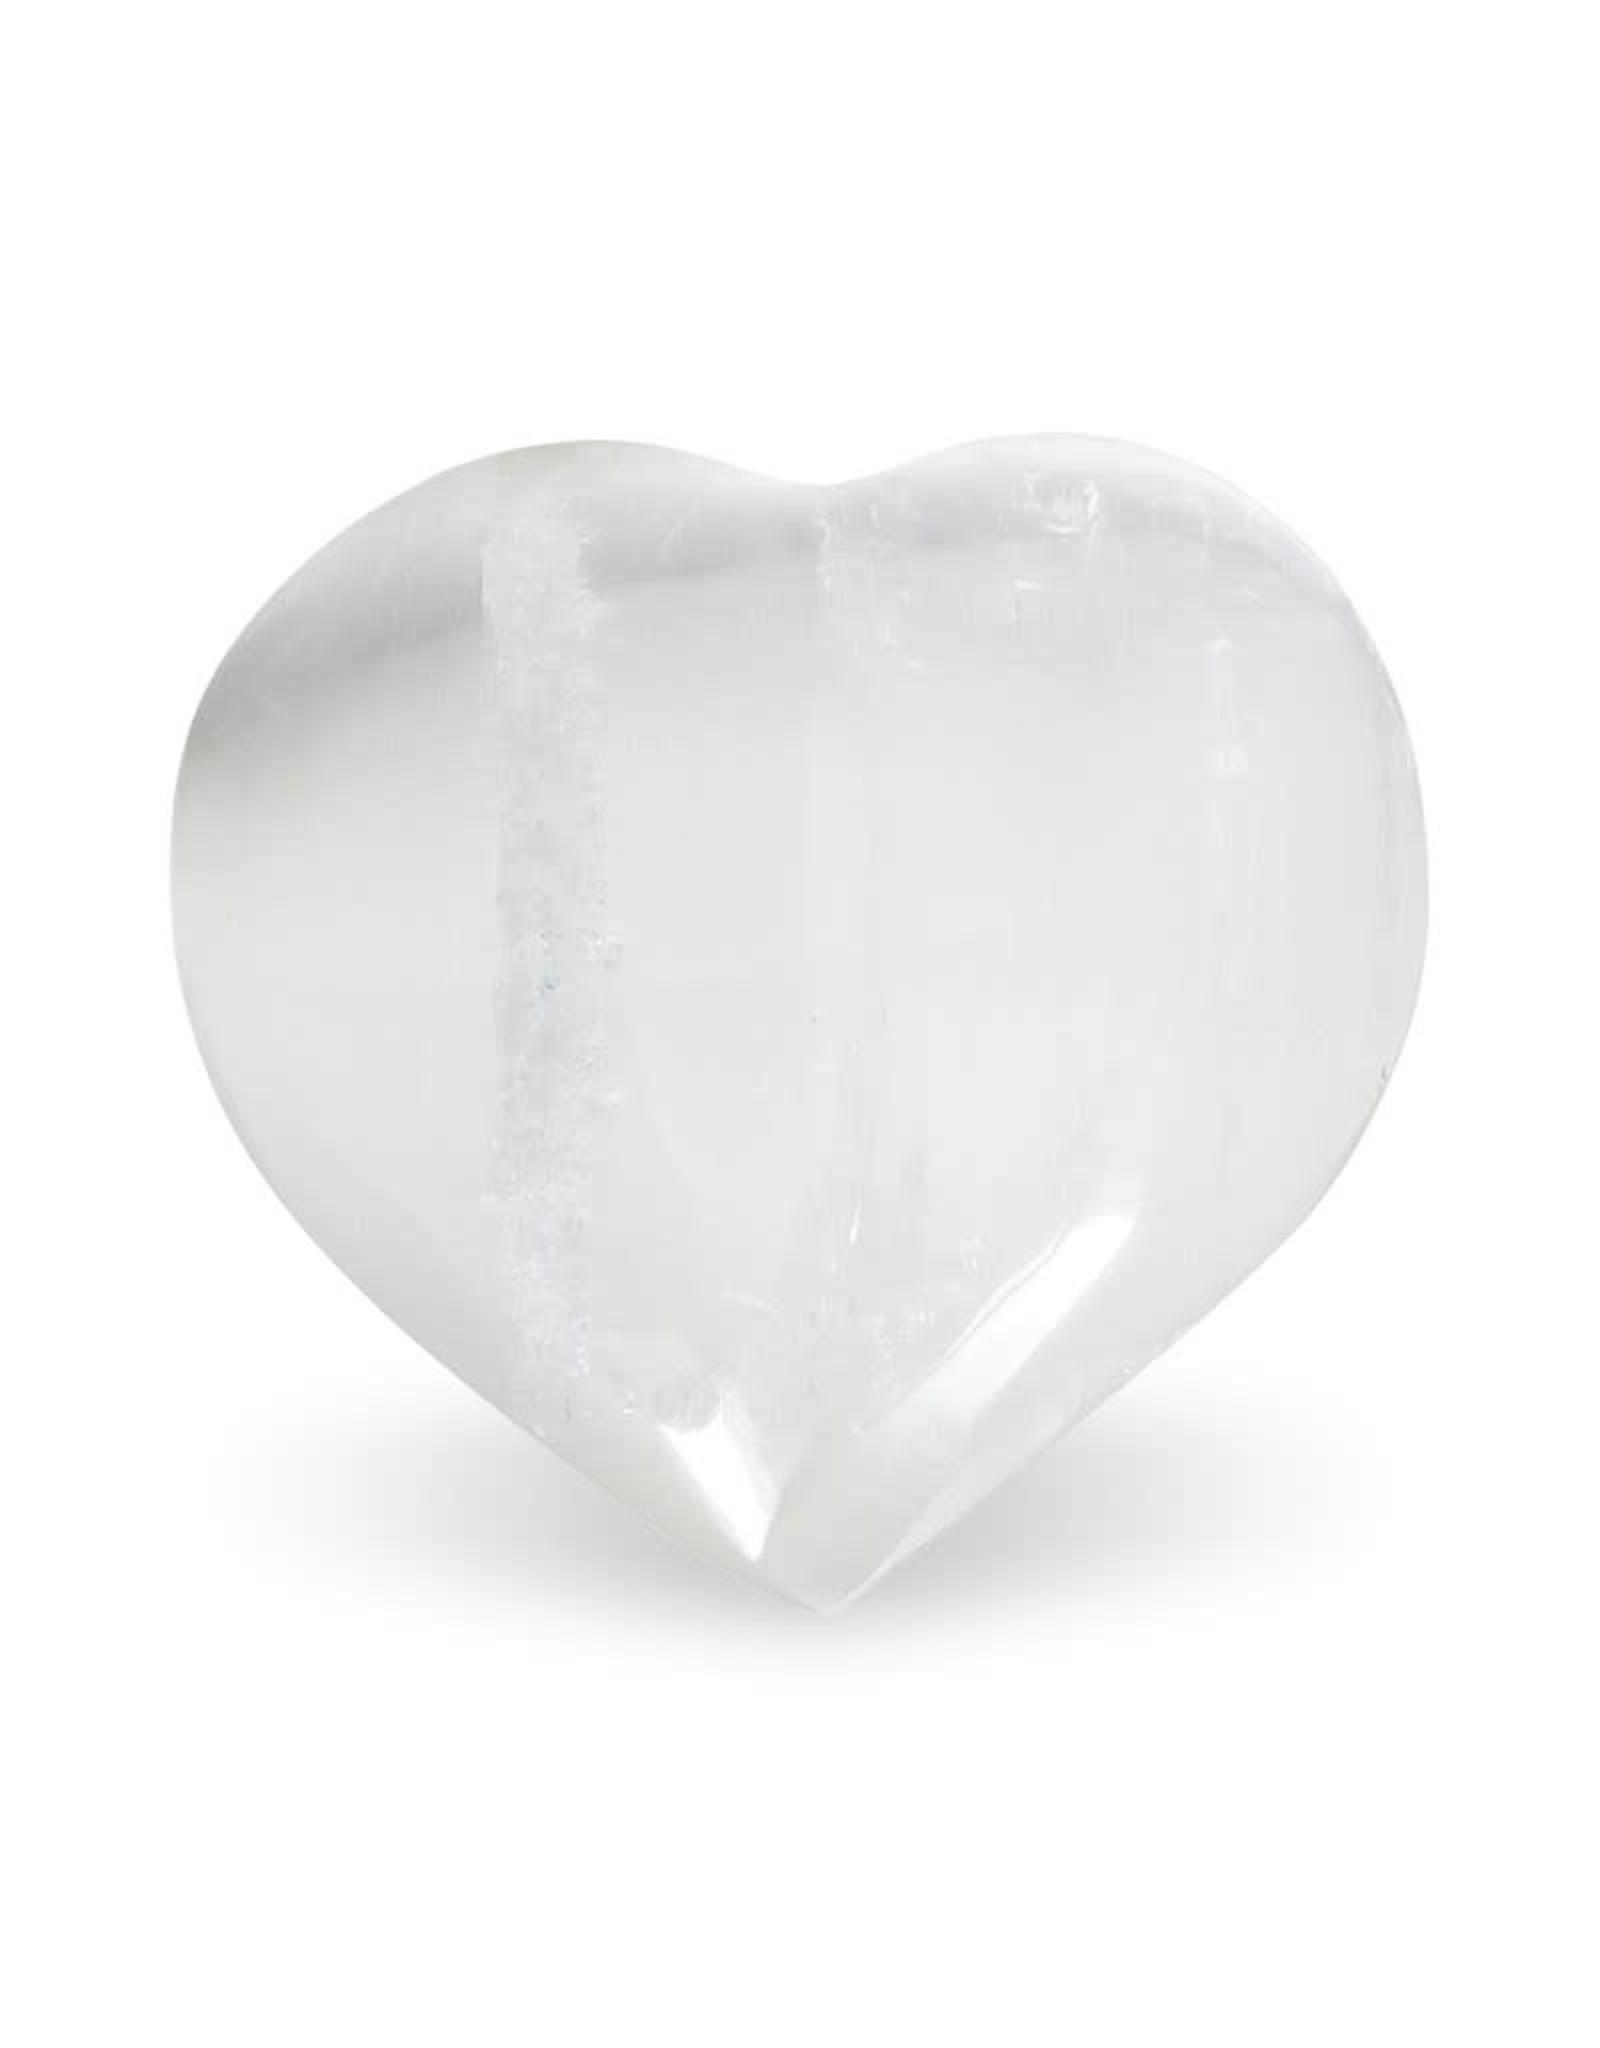 Knuffelsteen Seleniet wit